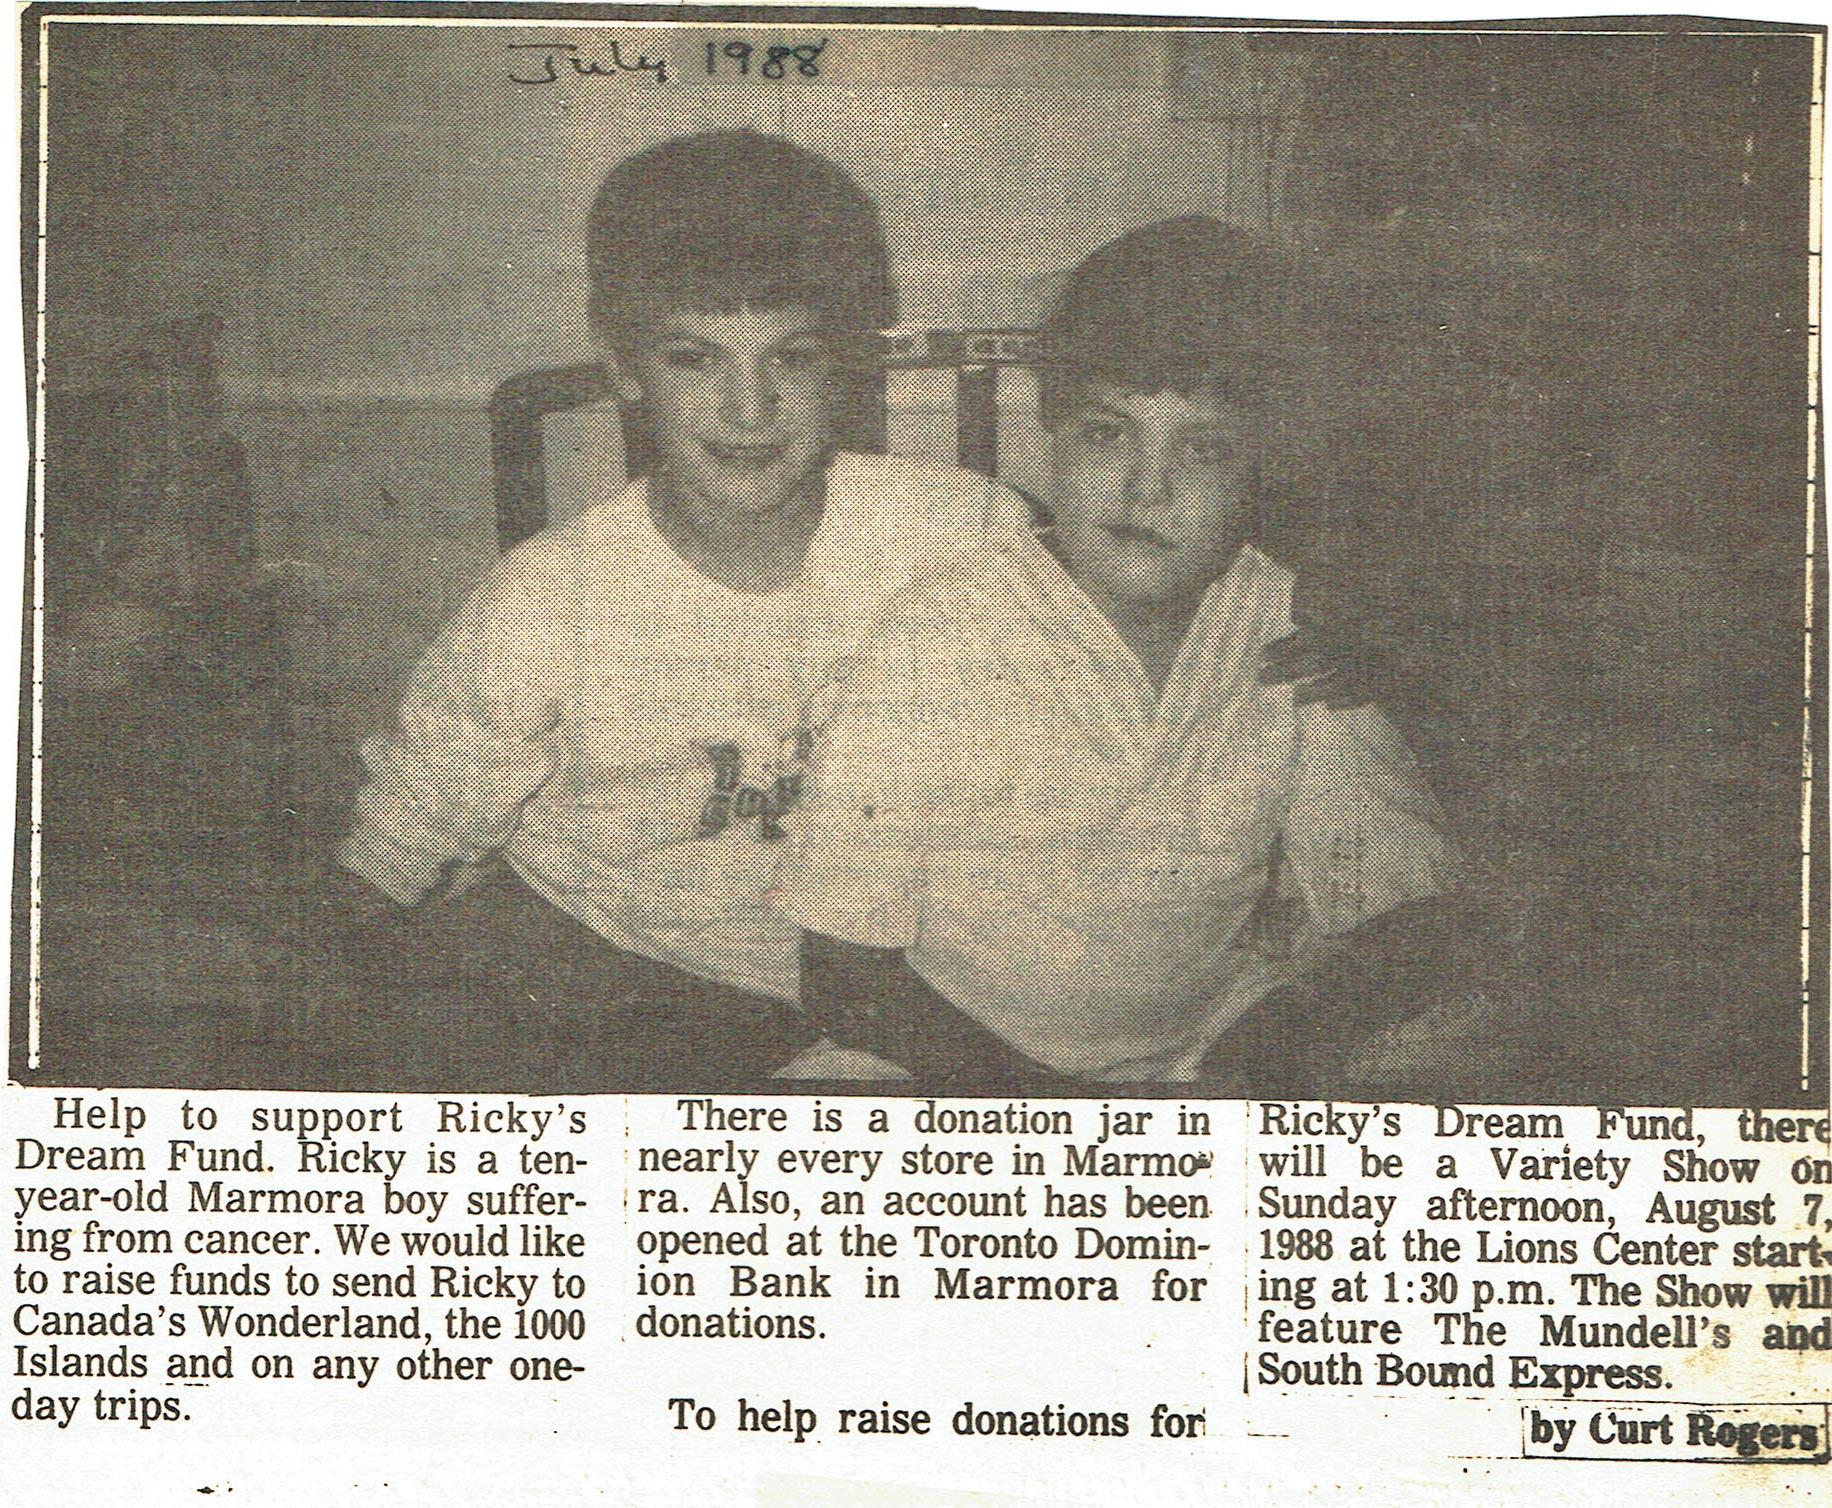 Ricky MacGillvery 1988 Dream Fund.jpg